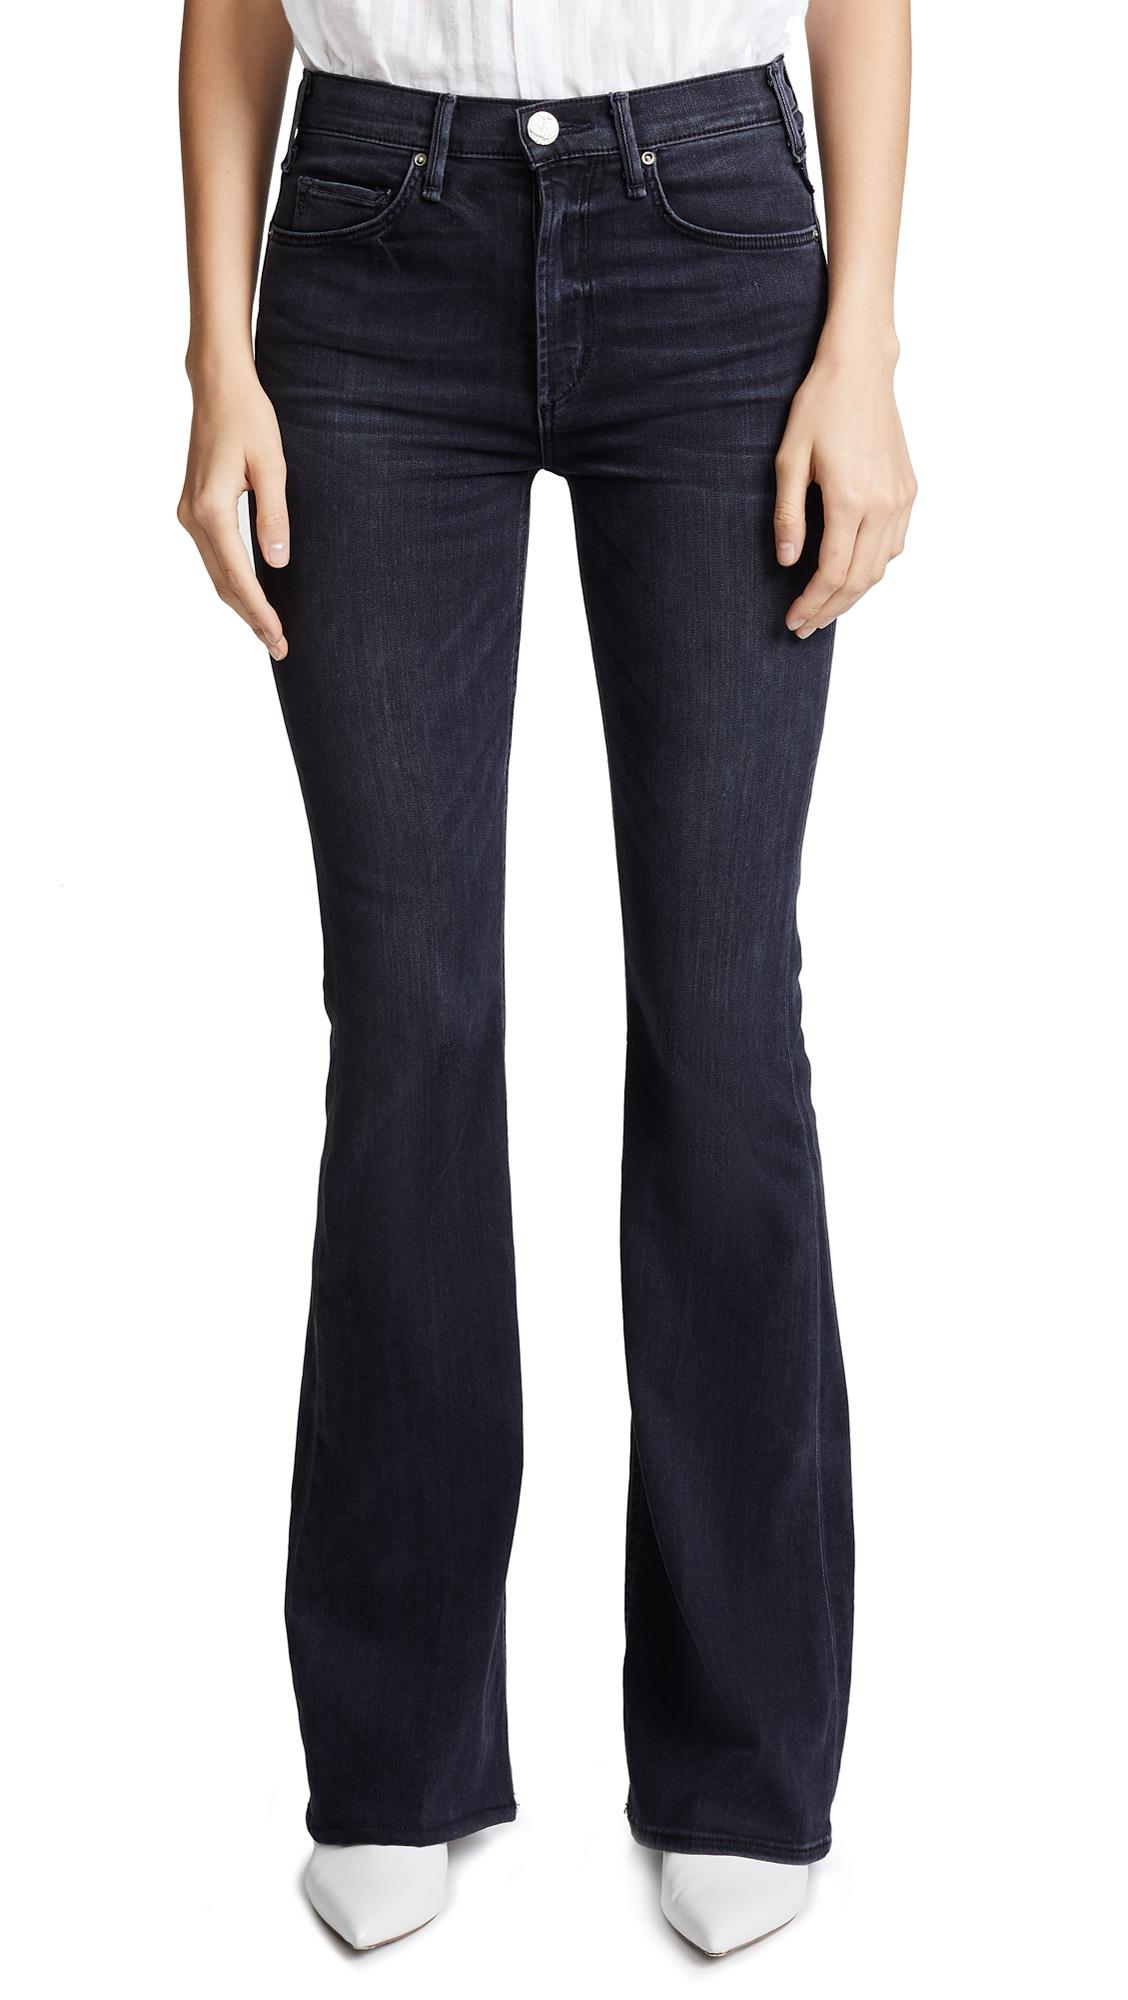 McGuire Denim Majorelle Flare Jeans In Ballerina Black